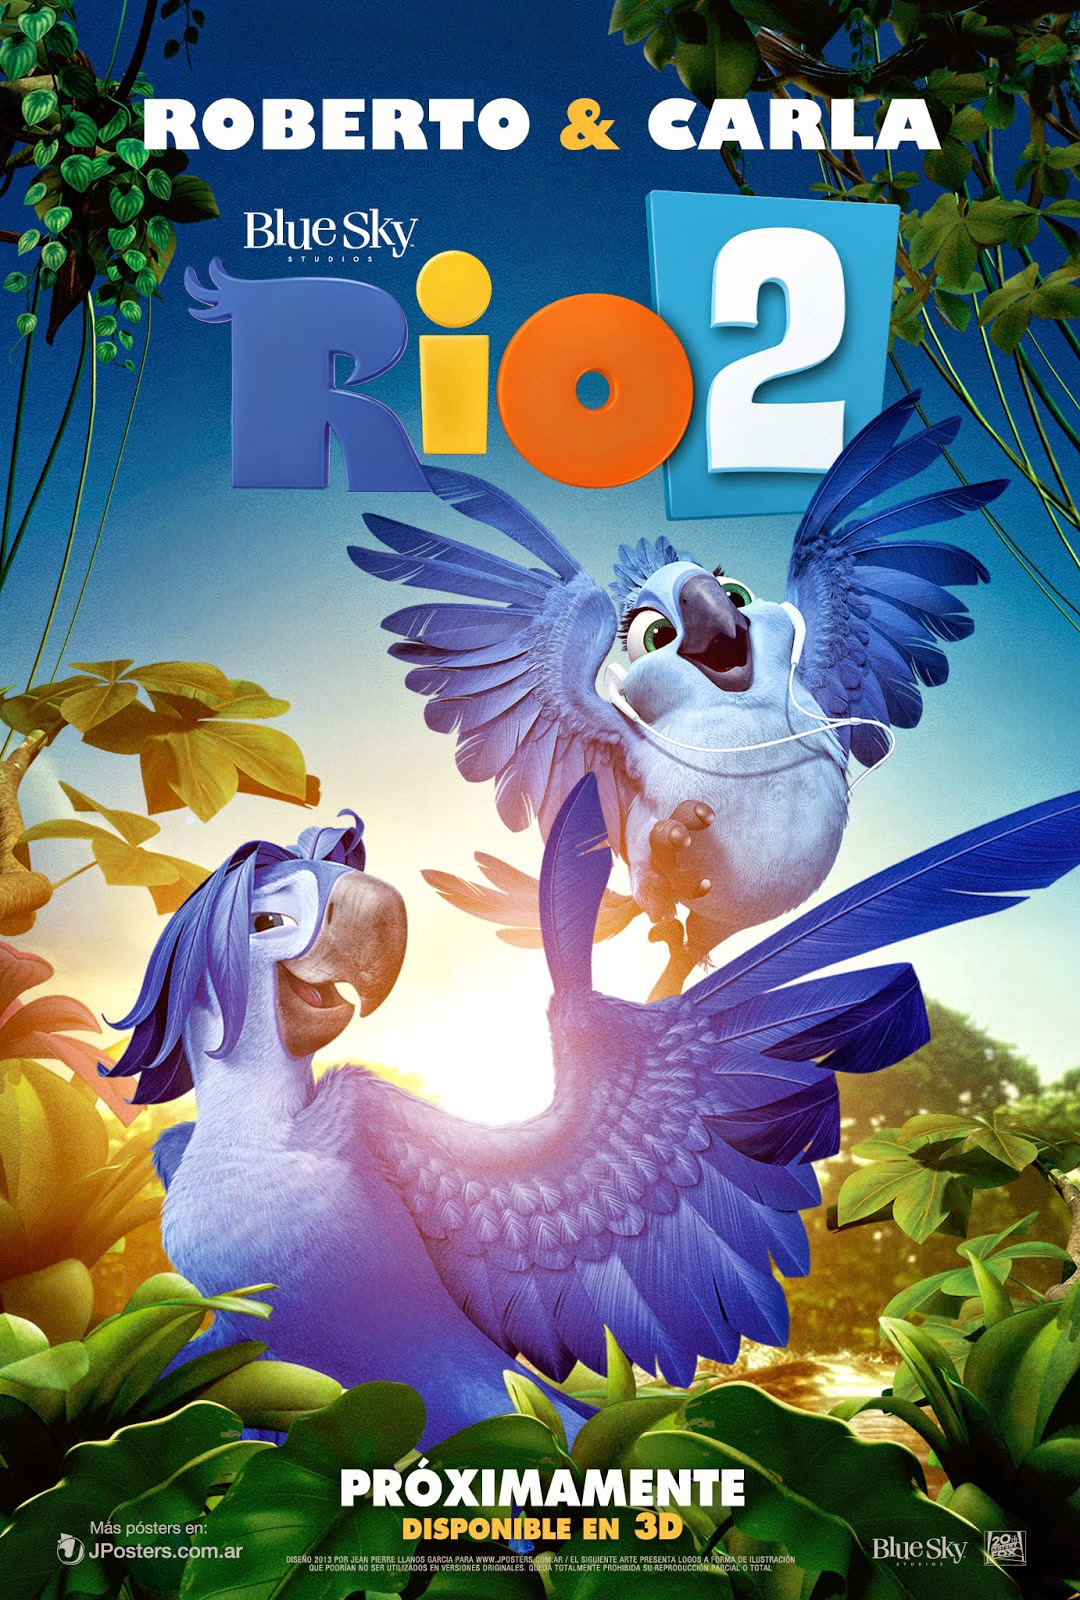 Rio 2 (2014) Full Version